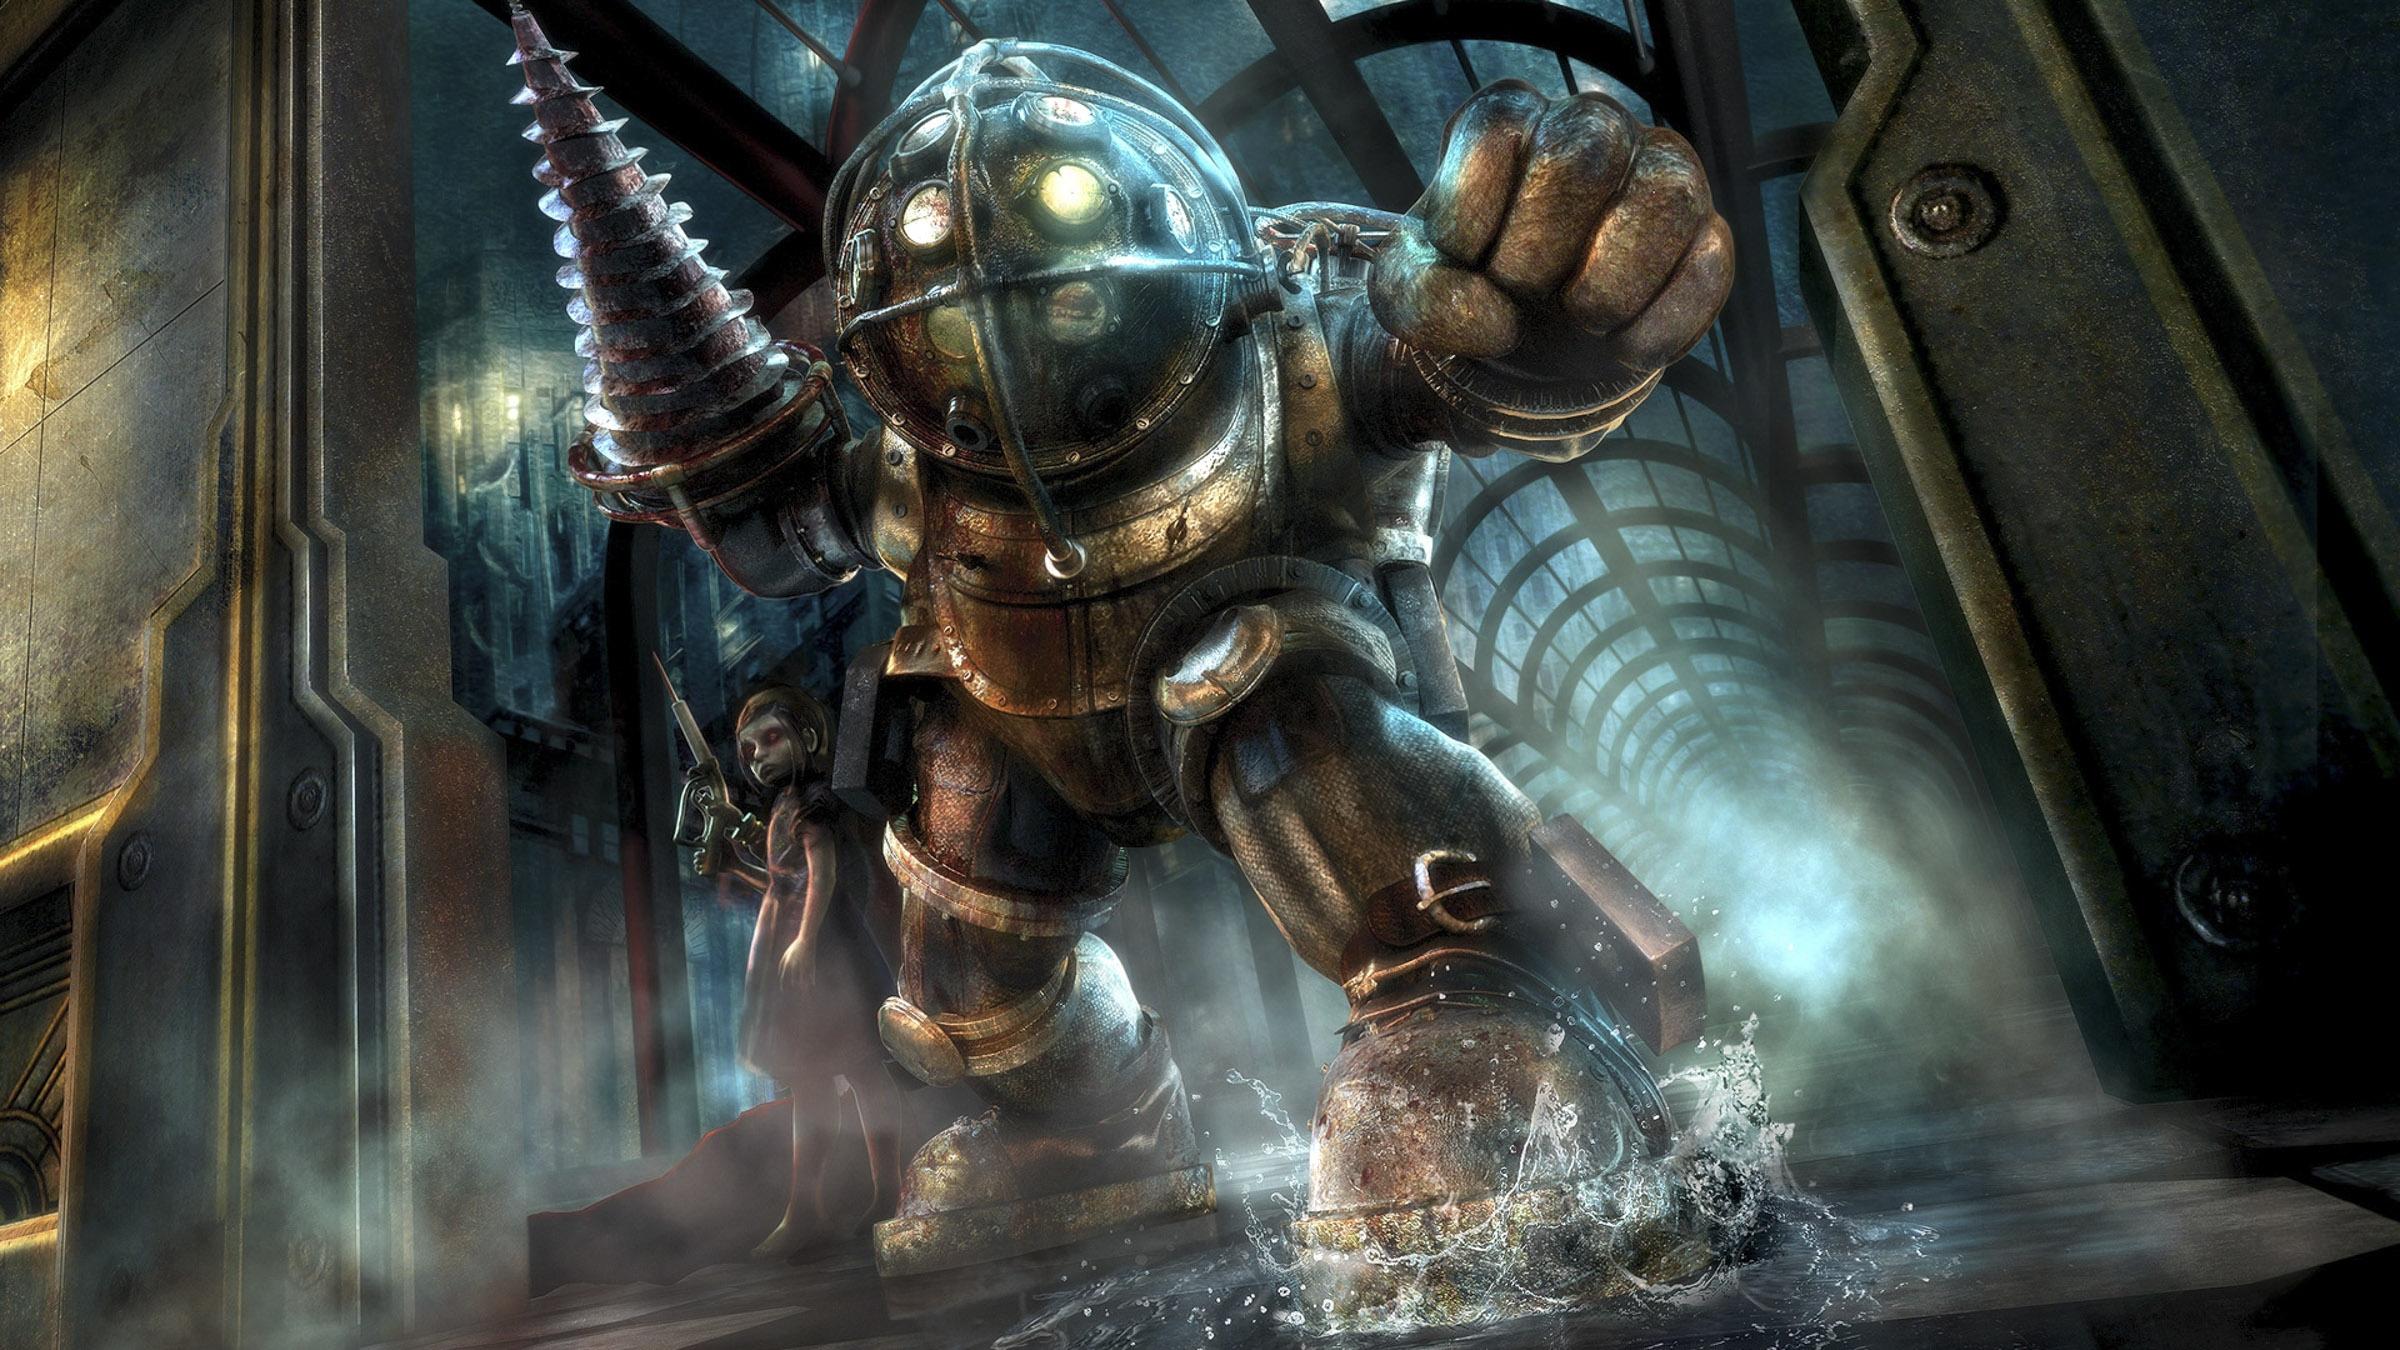 new bioshock game 2k games cloud chamber